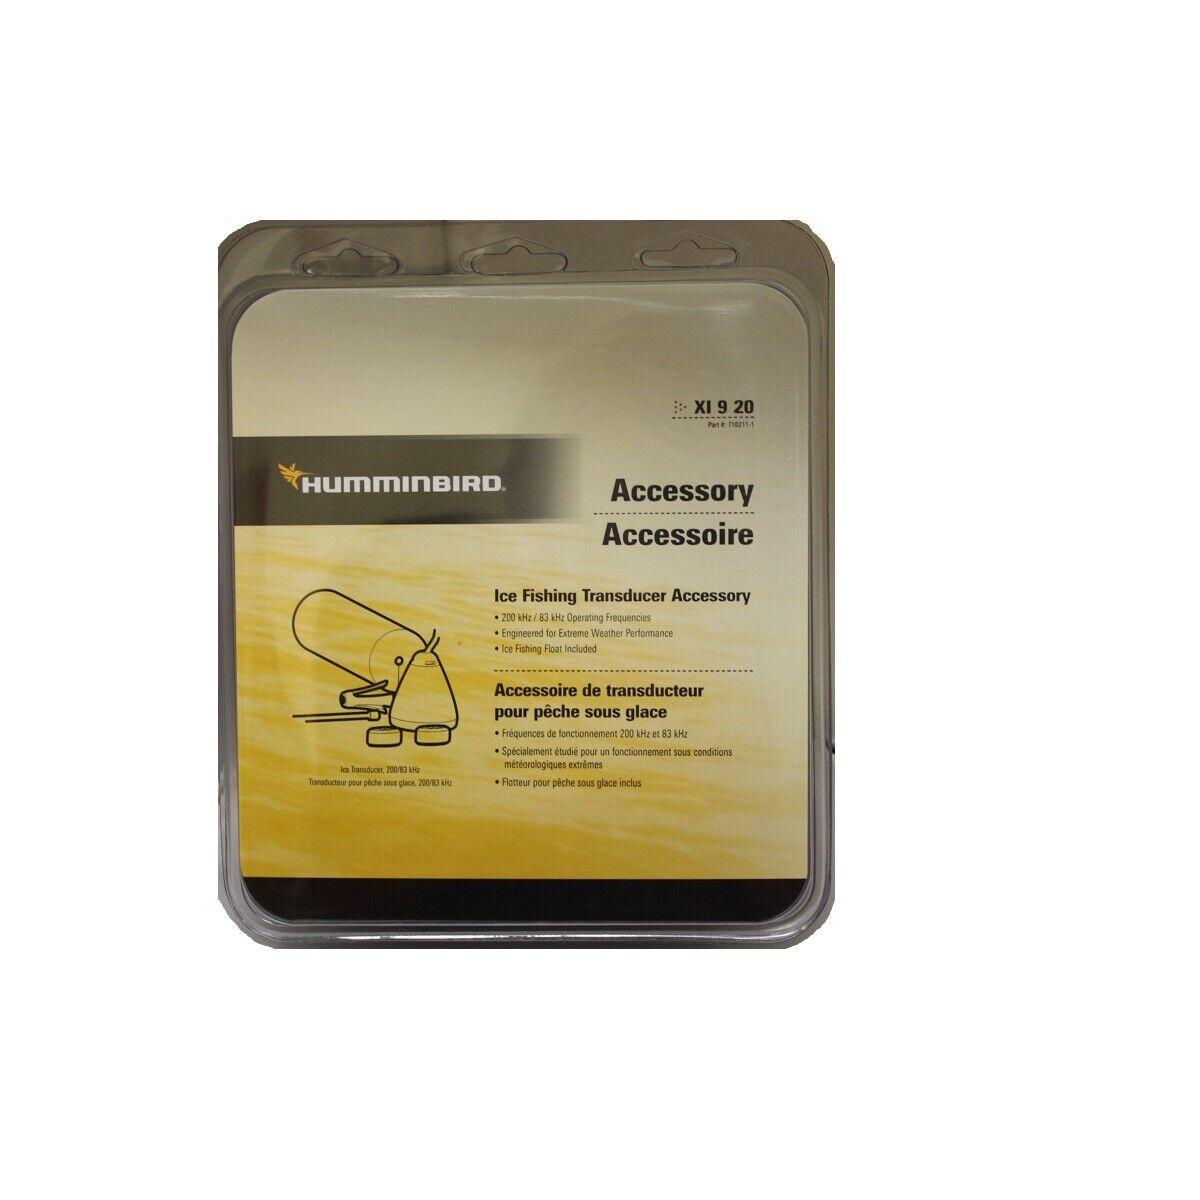 Humminbird Xi920 Ice Ducer Xi 9 20 710211-1